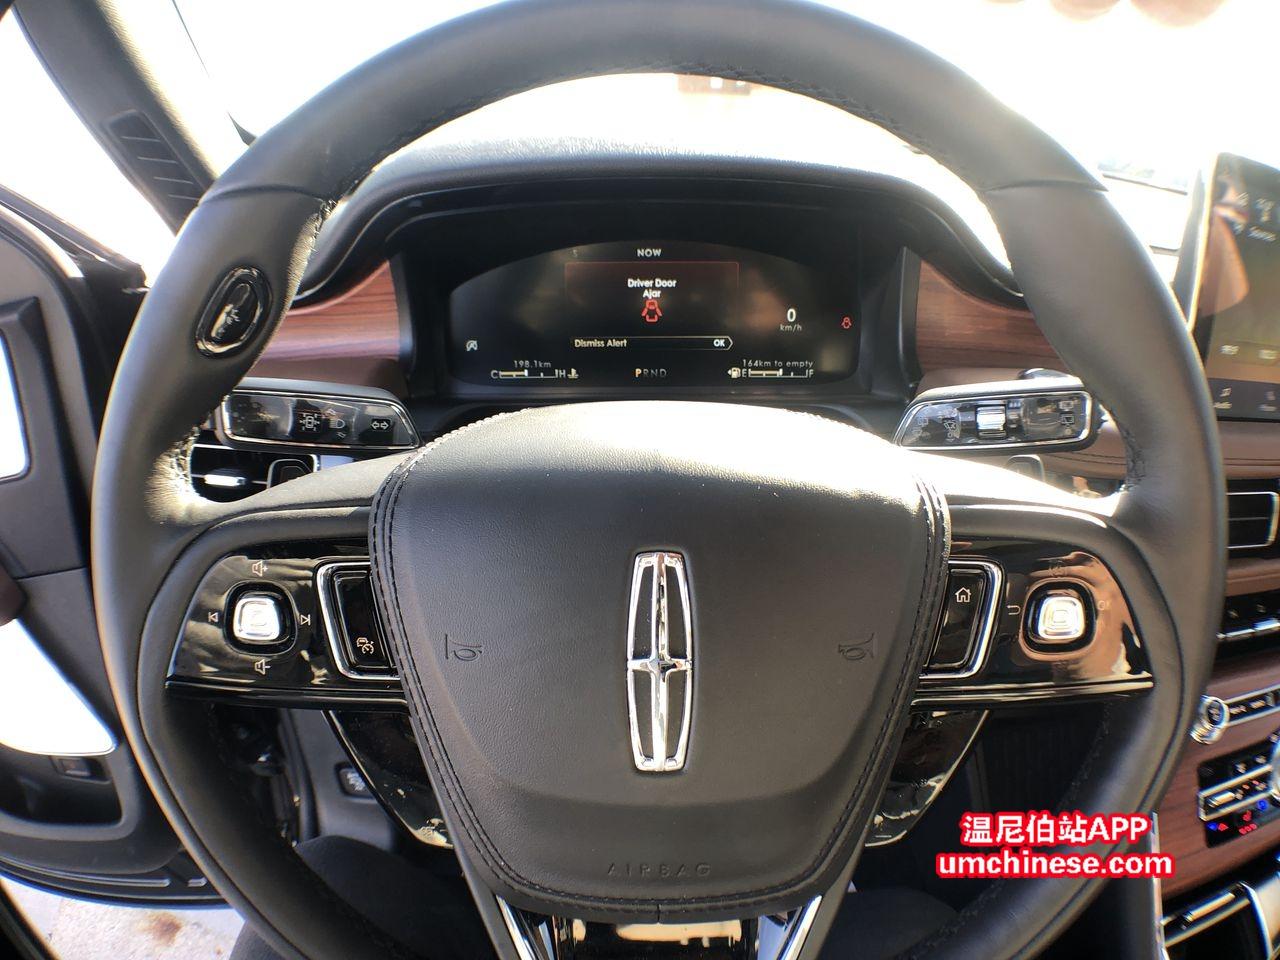 capital lincoln winnipeg 2020 aviator steering wheel.jpg